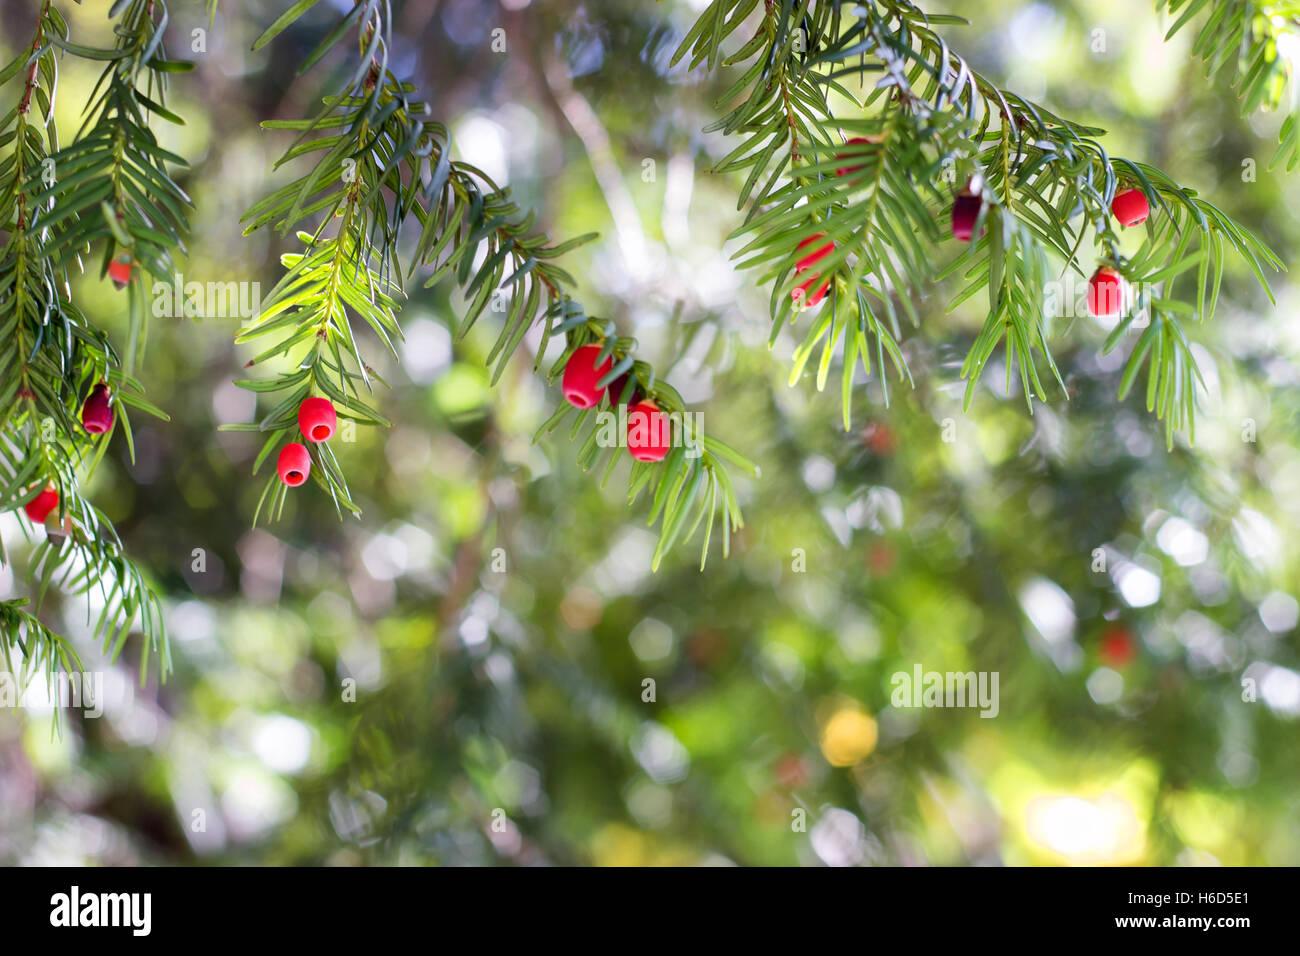 European yew (taxus baccata) tree - Stock Image